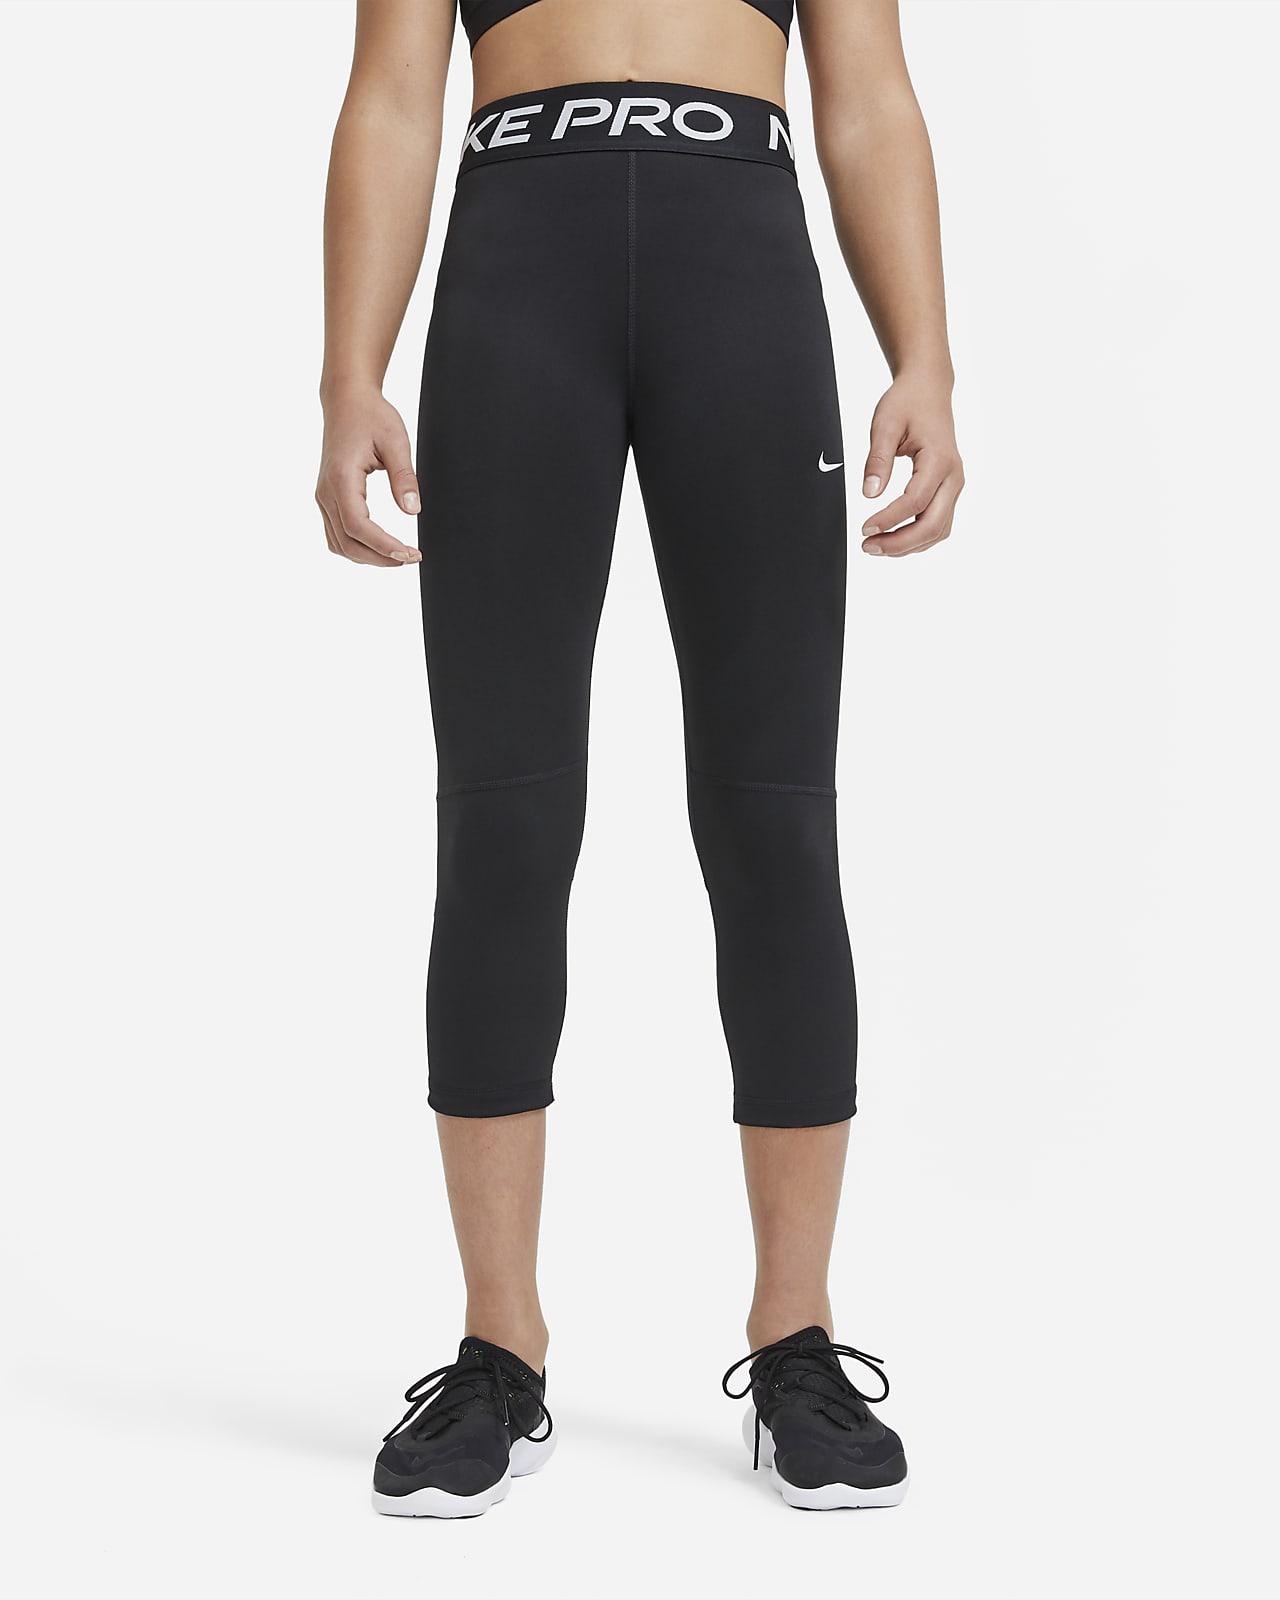 Nike Pro Carpi-Leggings für ältere Kinder (Mädchen)